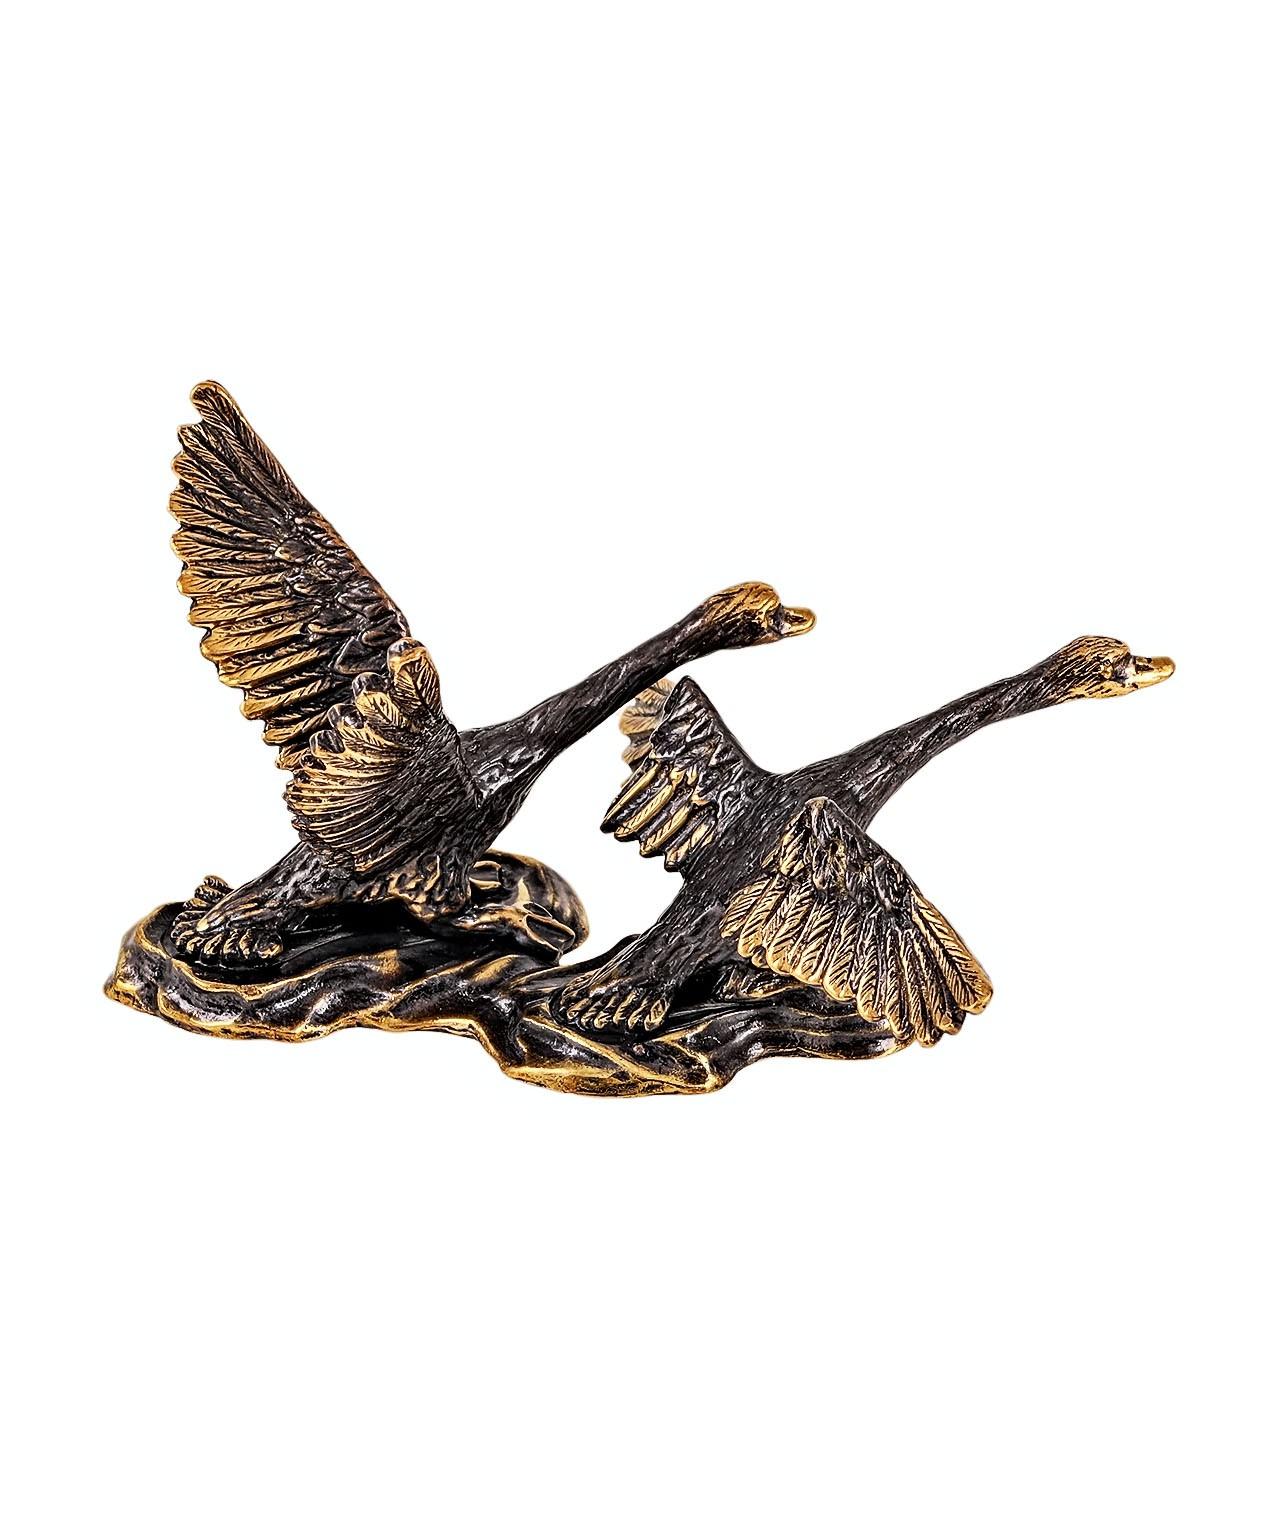 Птицы Лебеди улетаем на Юг без подставки 2034.1